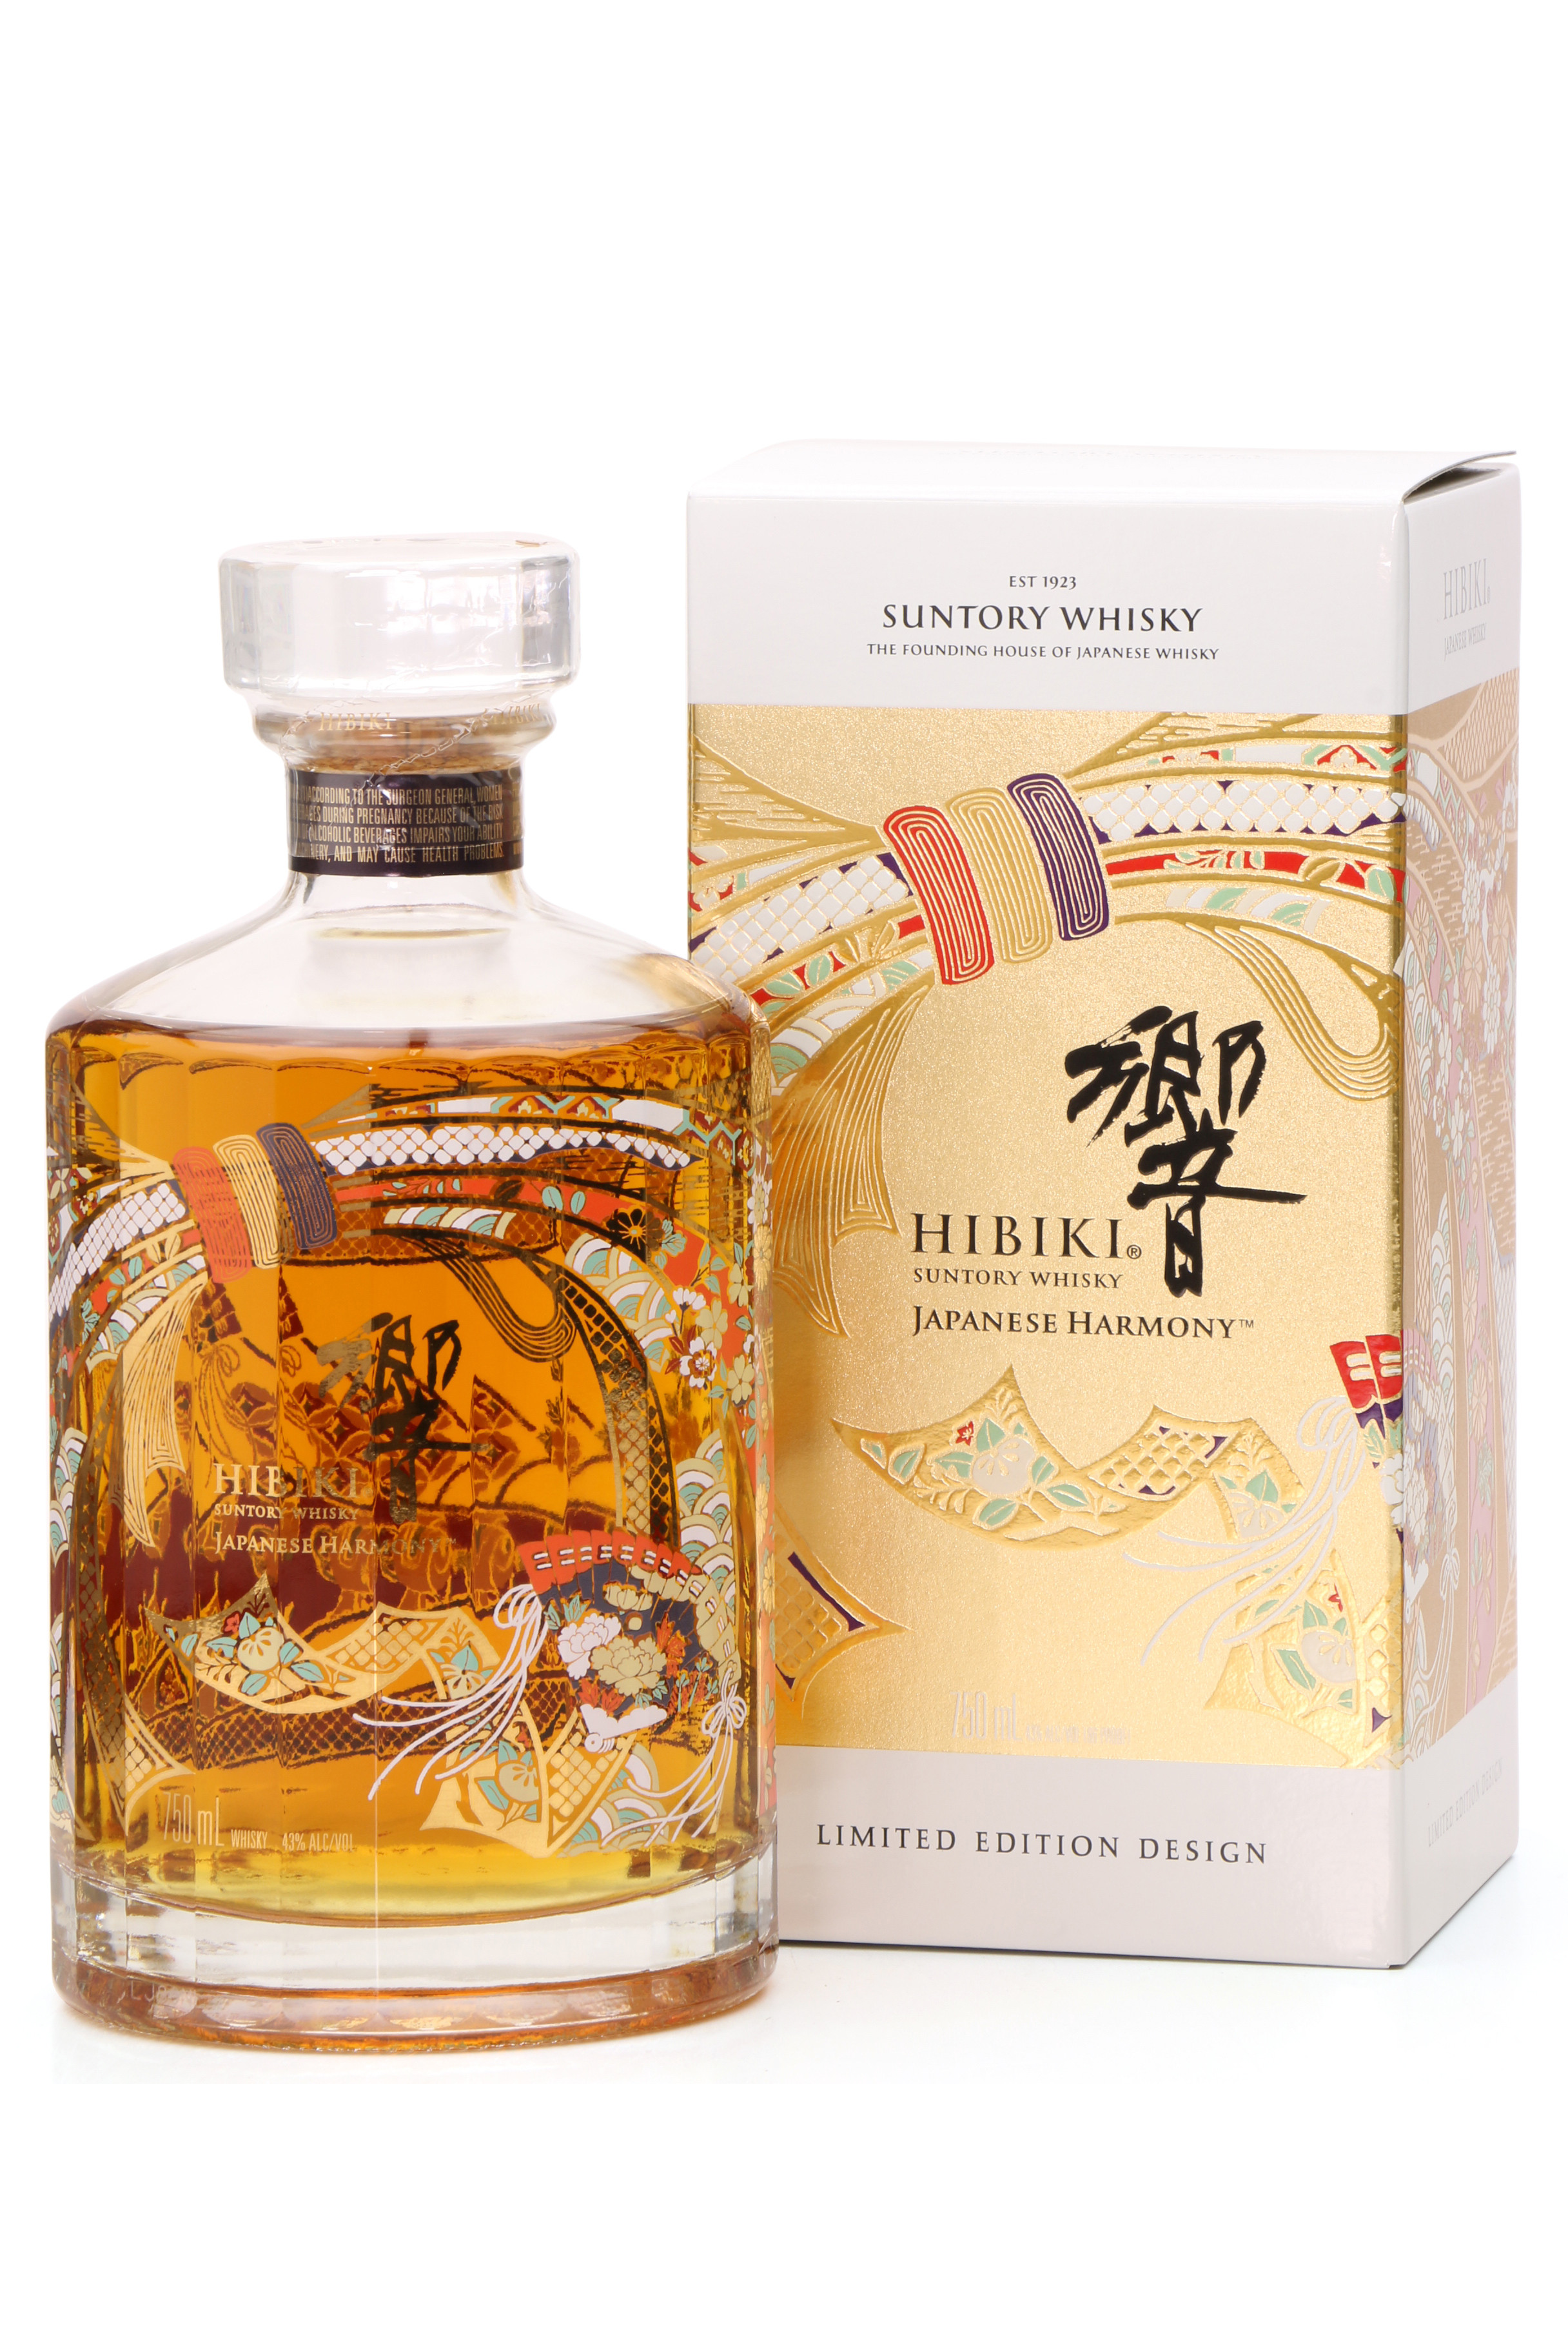 hibiki japanese harmony - 30th anniversary limited edition design